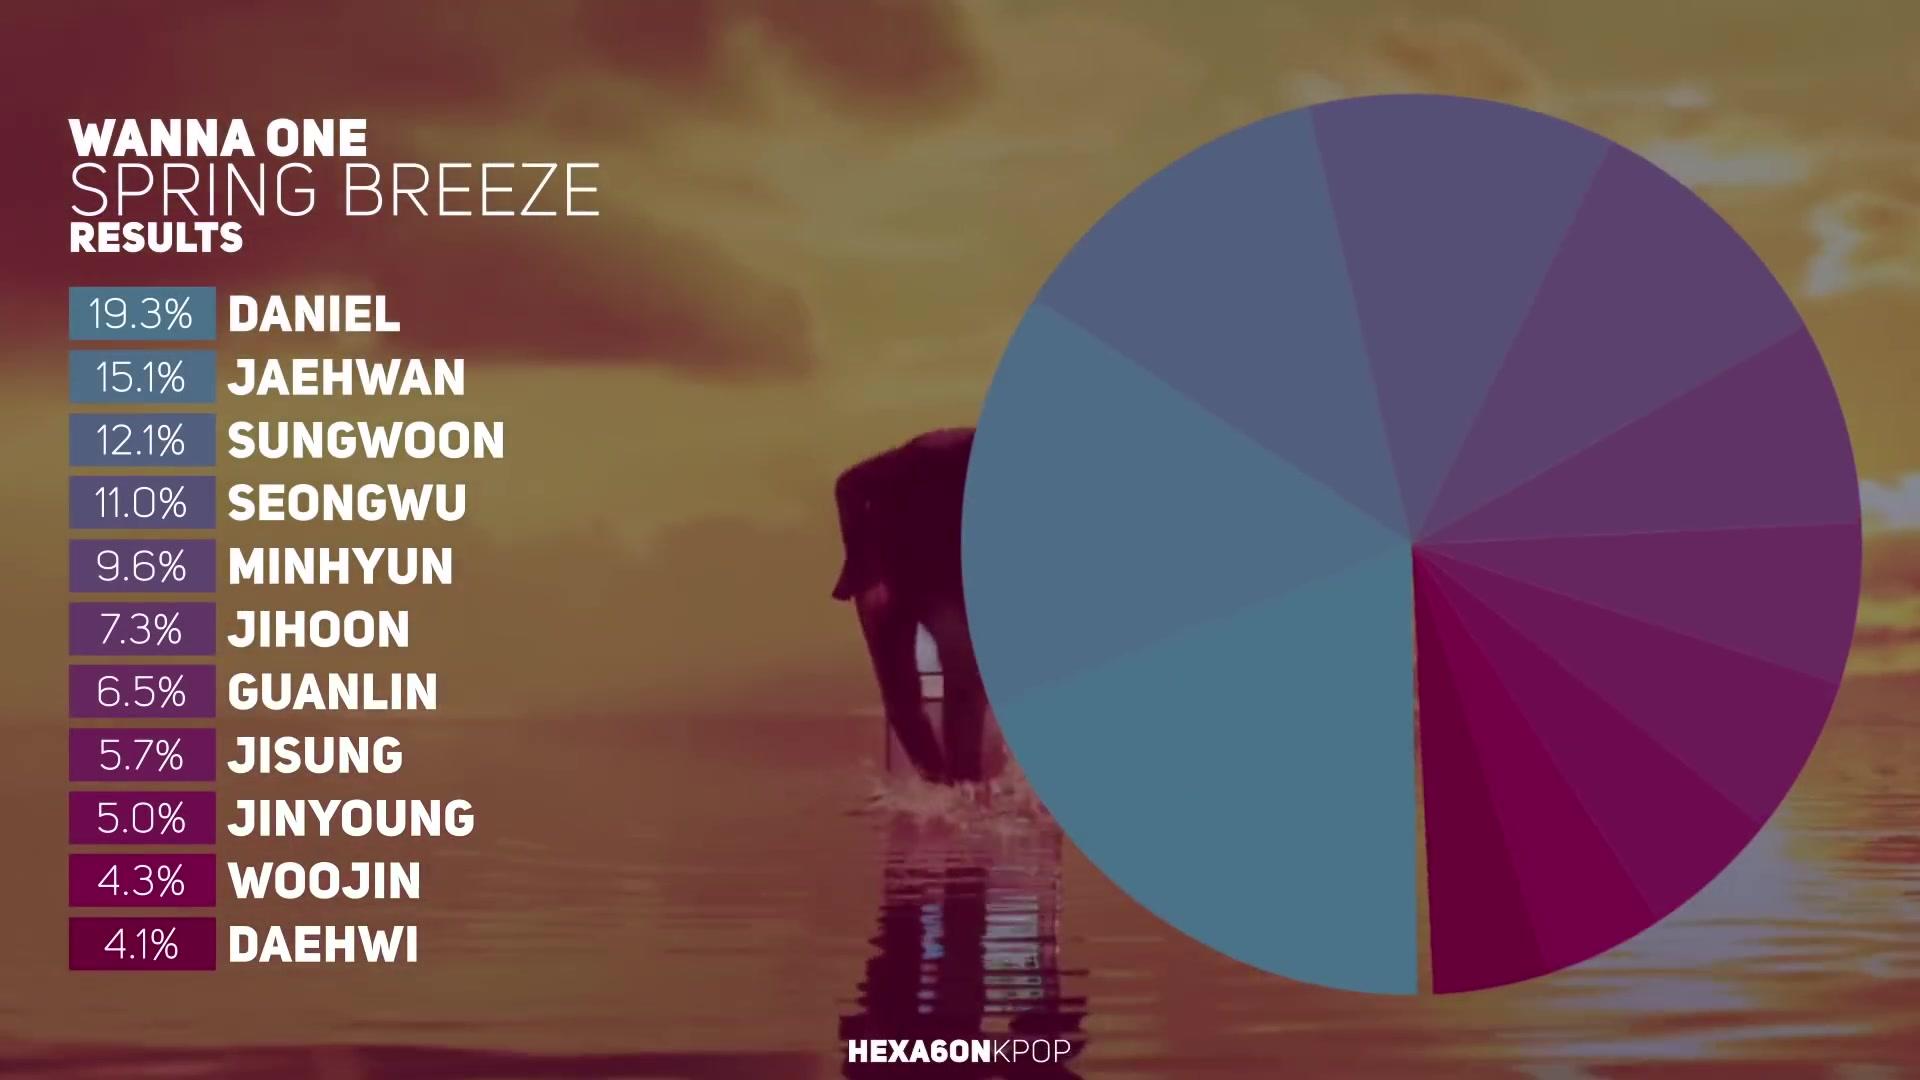 Wanna One Spring Breeze春风歌词分配分量 哔哩哔哩 つロ干杯